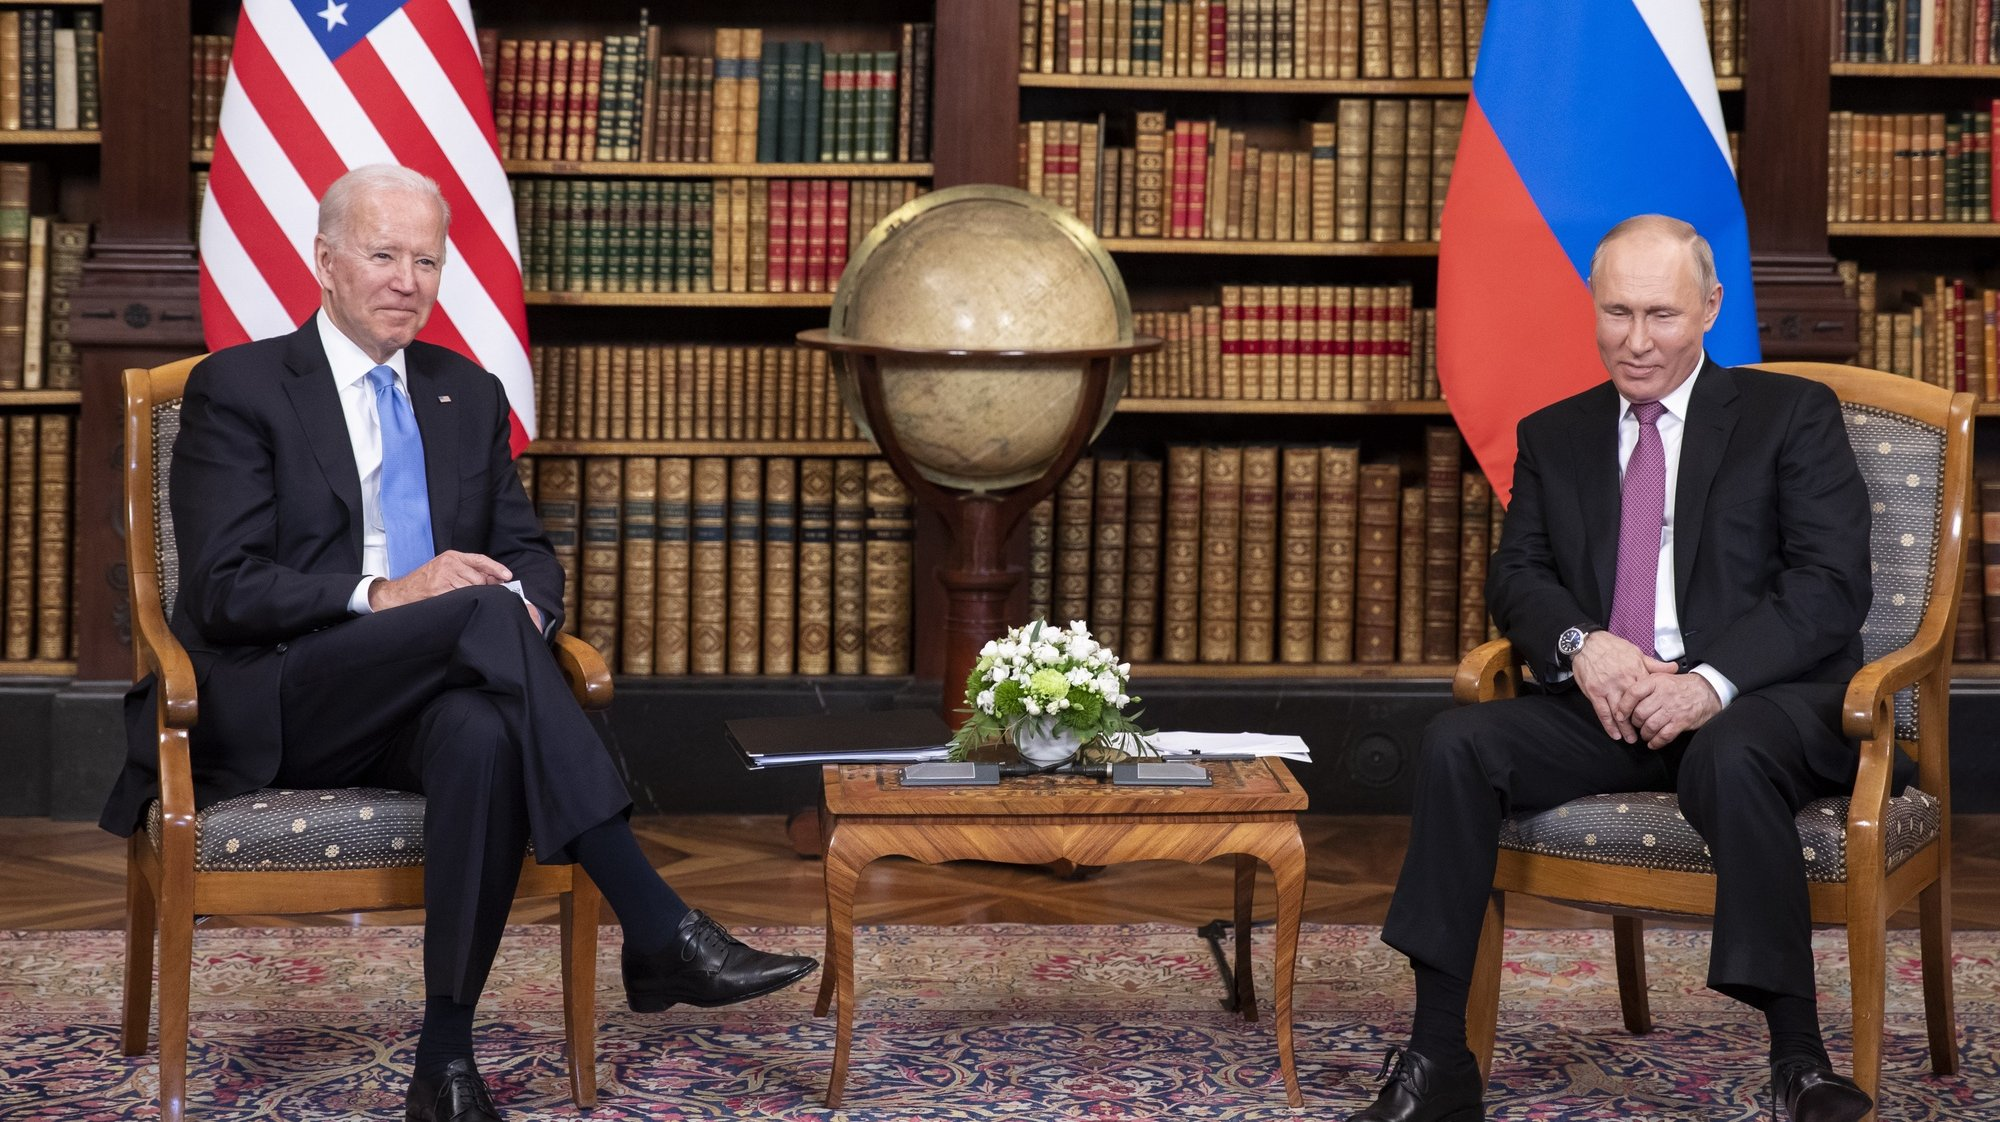 epa09277245 US President Joe Biden and Russian President Vladimir Putin during the US-Russia summit in Geneva, Switzerland, 16 June 2021.  EPA/PETER KLAUNZER / POOL